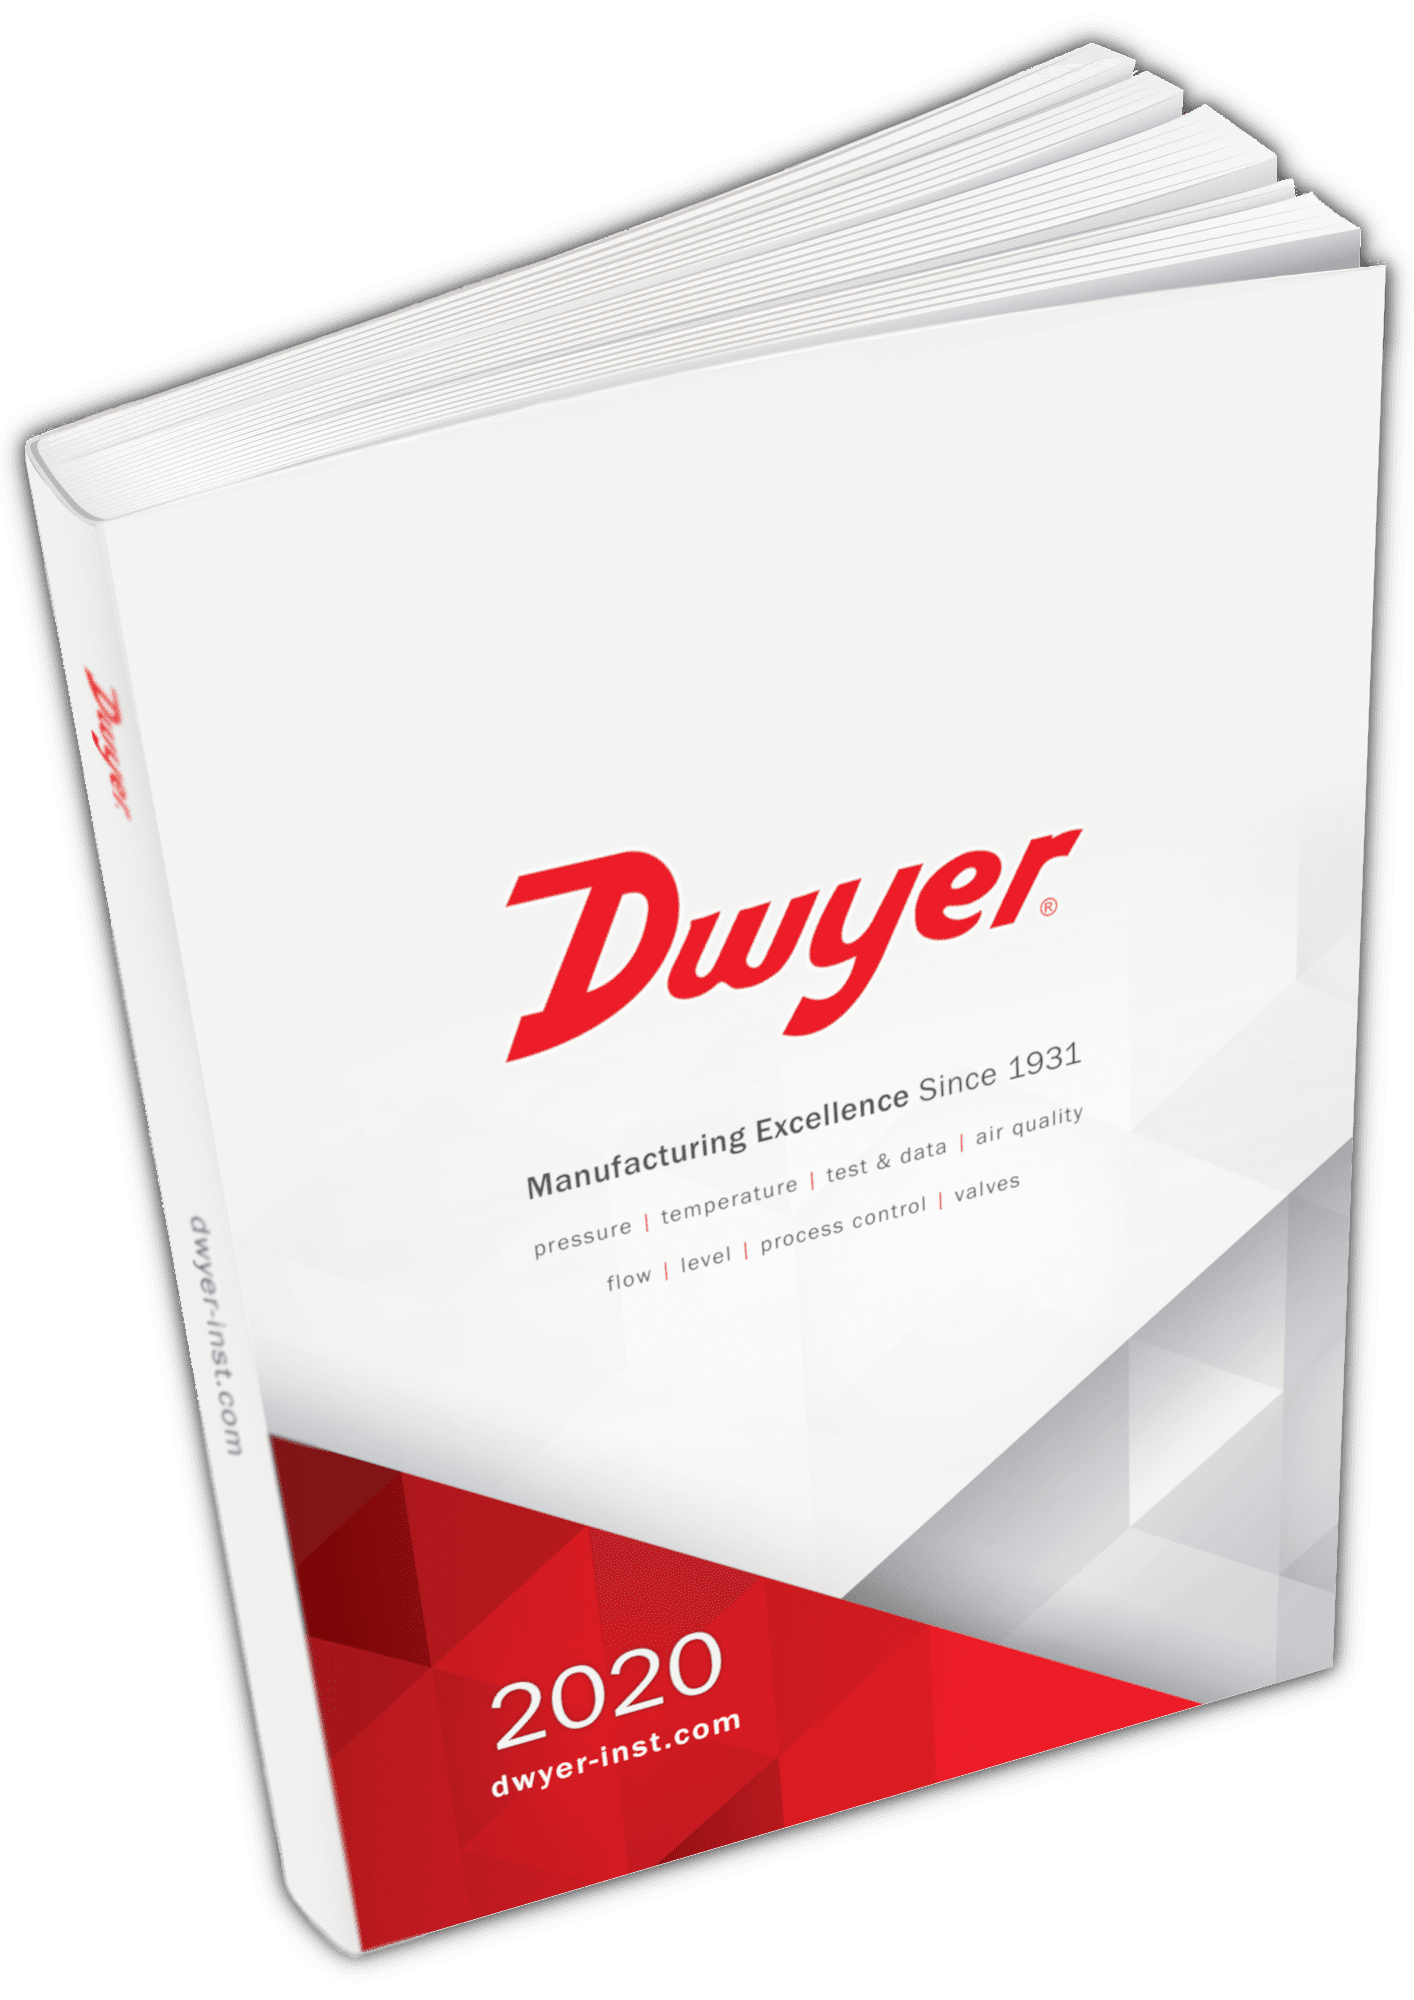 Dwyer-catalogus 2020 bij Hitma verkrijgbaar